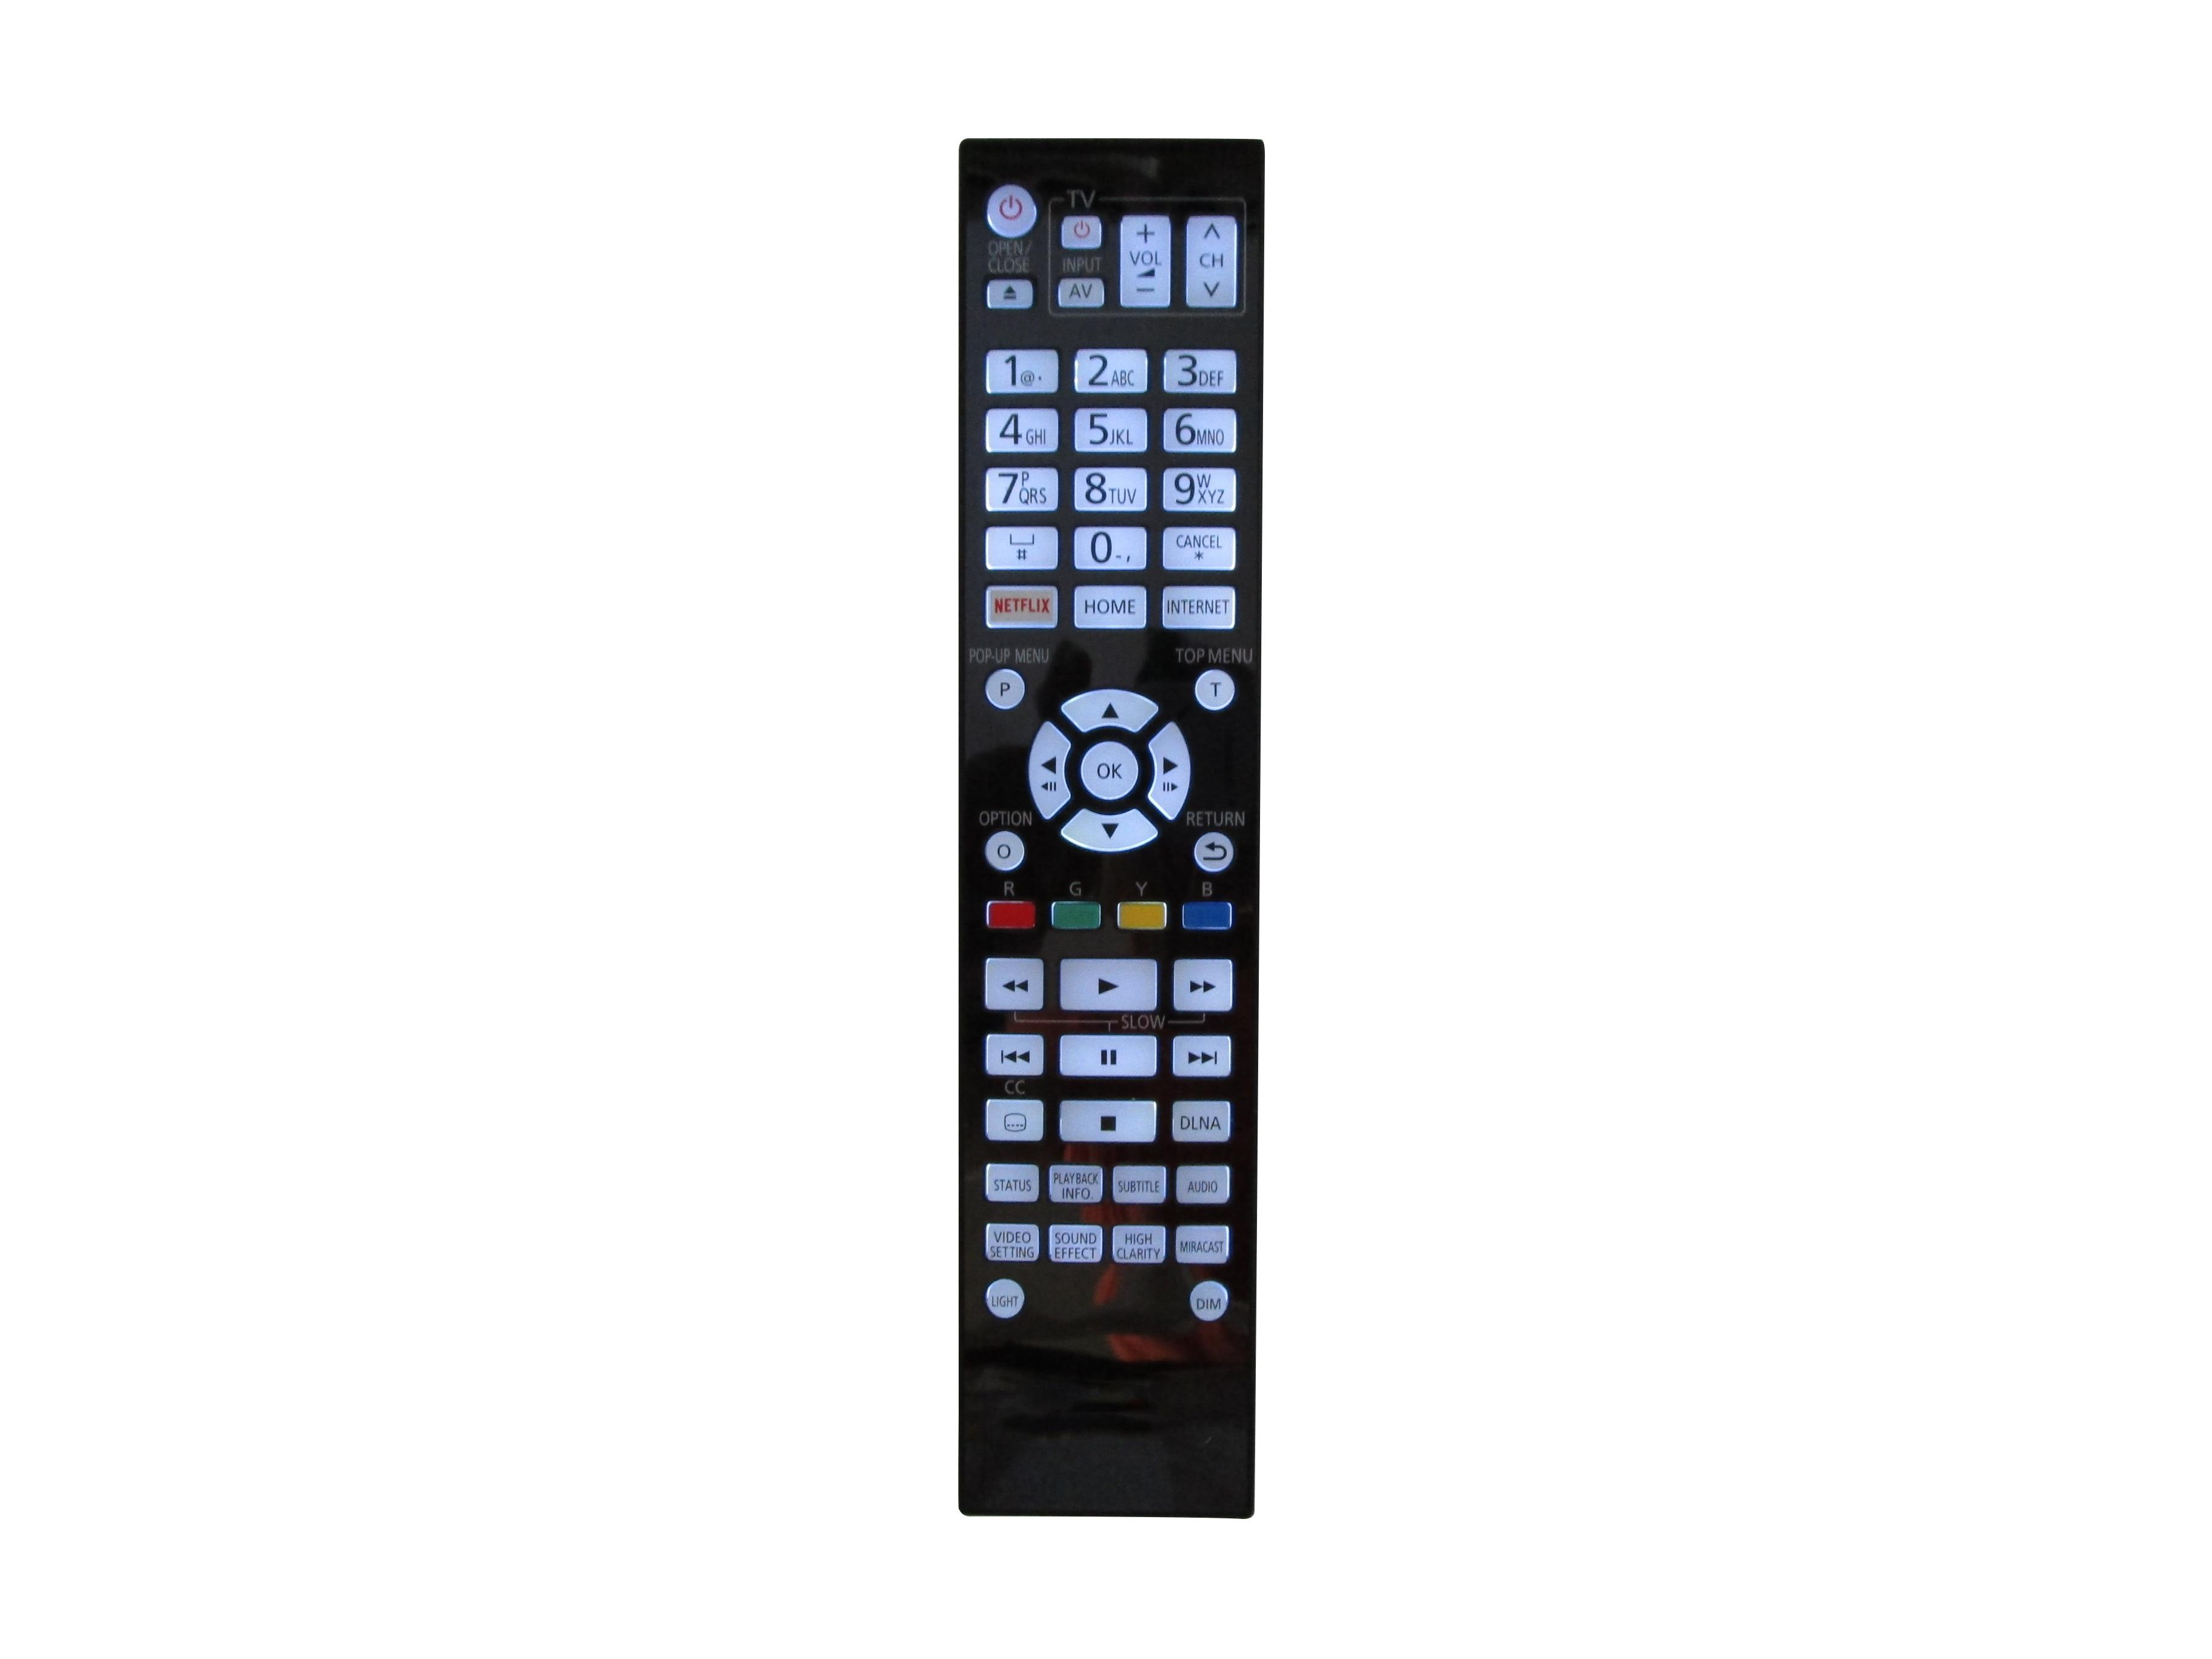 Controle remoto para panasonic n2qaya000131 DMP-UB900 DMP-UB900-K DMP-UB900EBK ultrahd 4k blu-ray dvd disc player